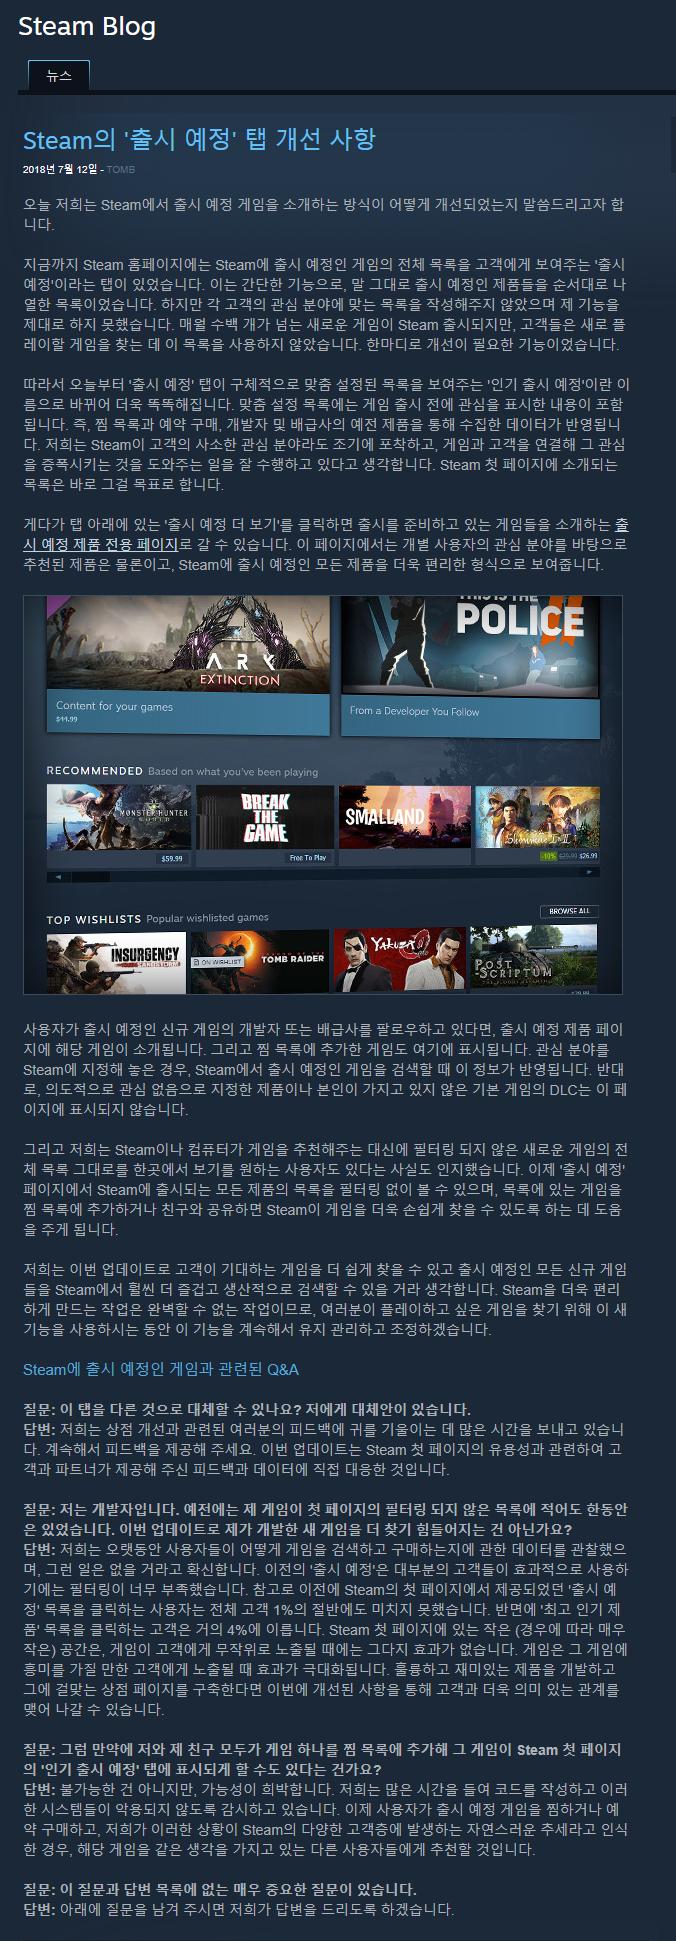 FireShot Screen Capture #036 - 'Steam Blog __ Steam의 '출시 예정' 탭 개선 사항' - steamcommunity_com_games_593110_announcements_detail_1699429118305015582.png